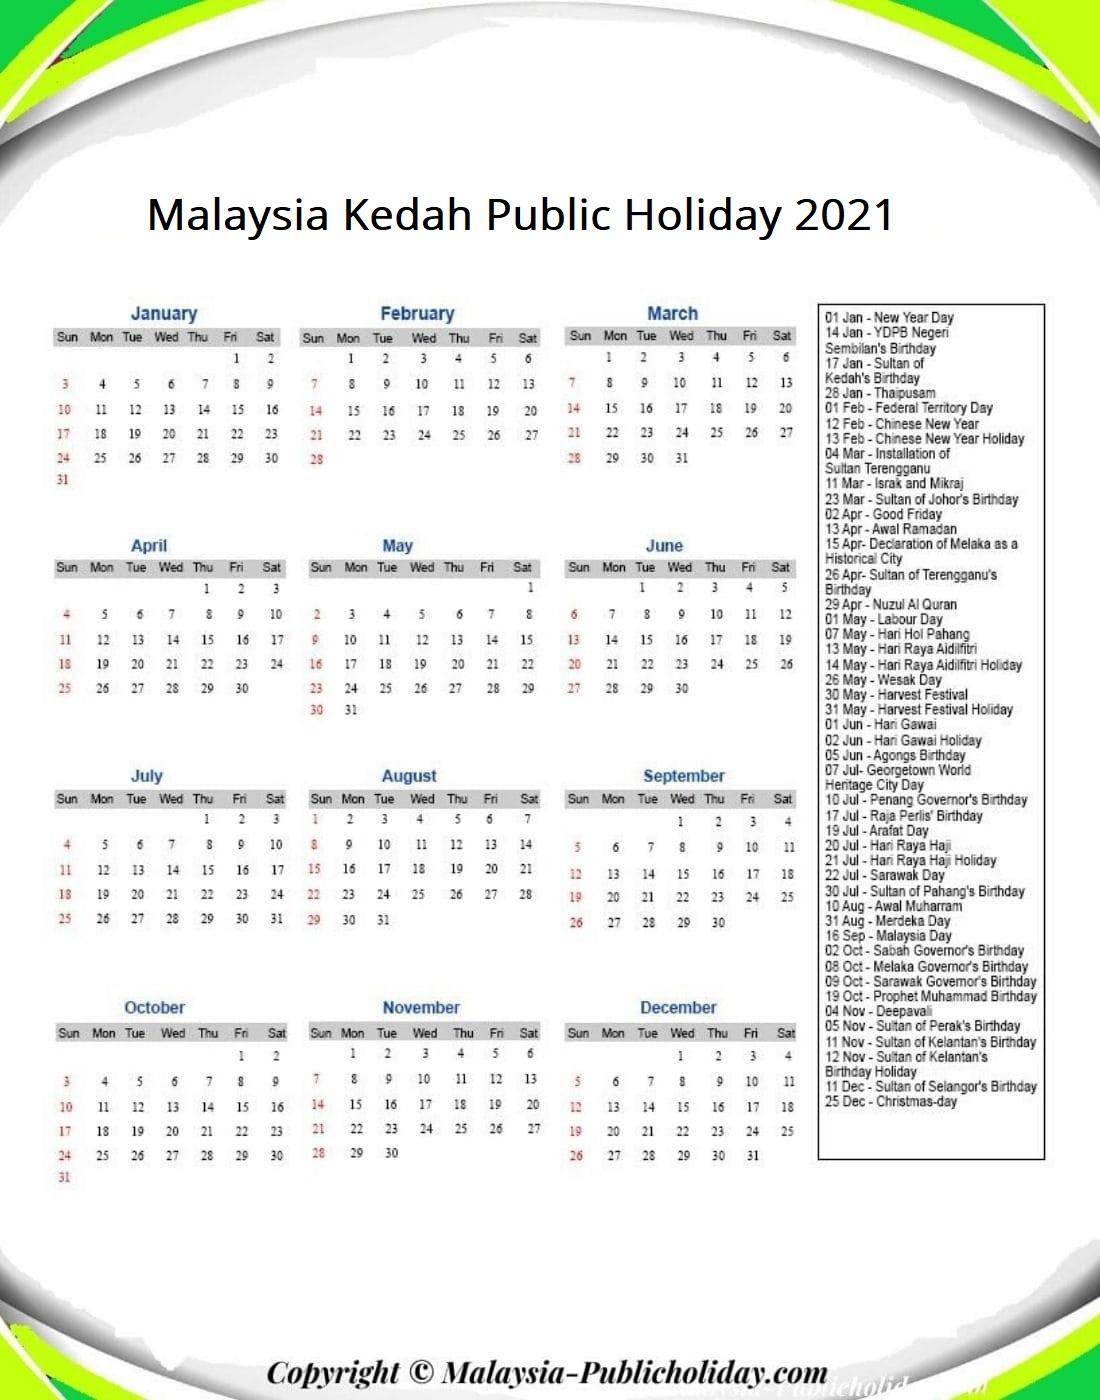 Kedah Calendars with Holidays 2021